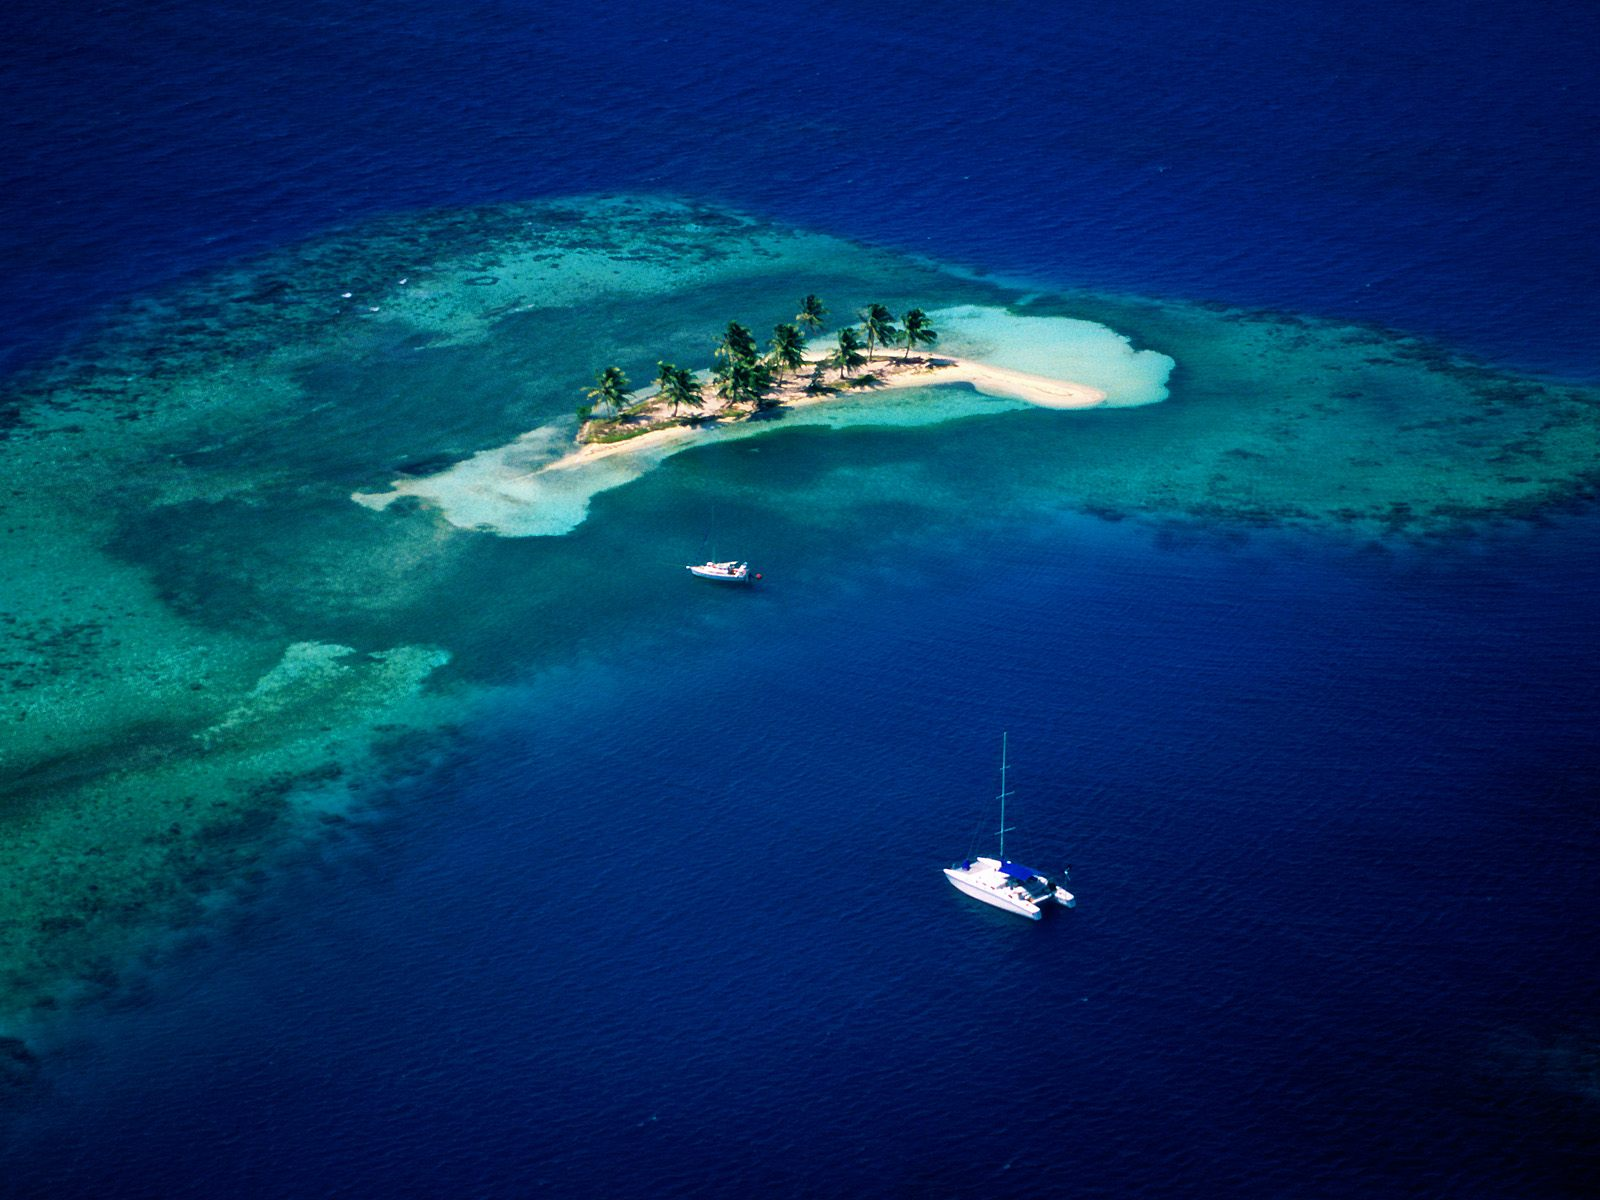 Goff's Cay, Belize — 17° 21.00'N 88° 02.18'W